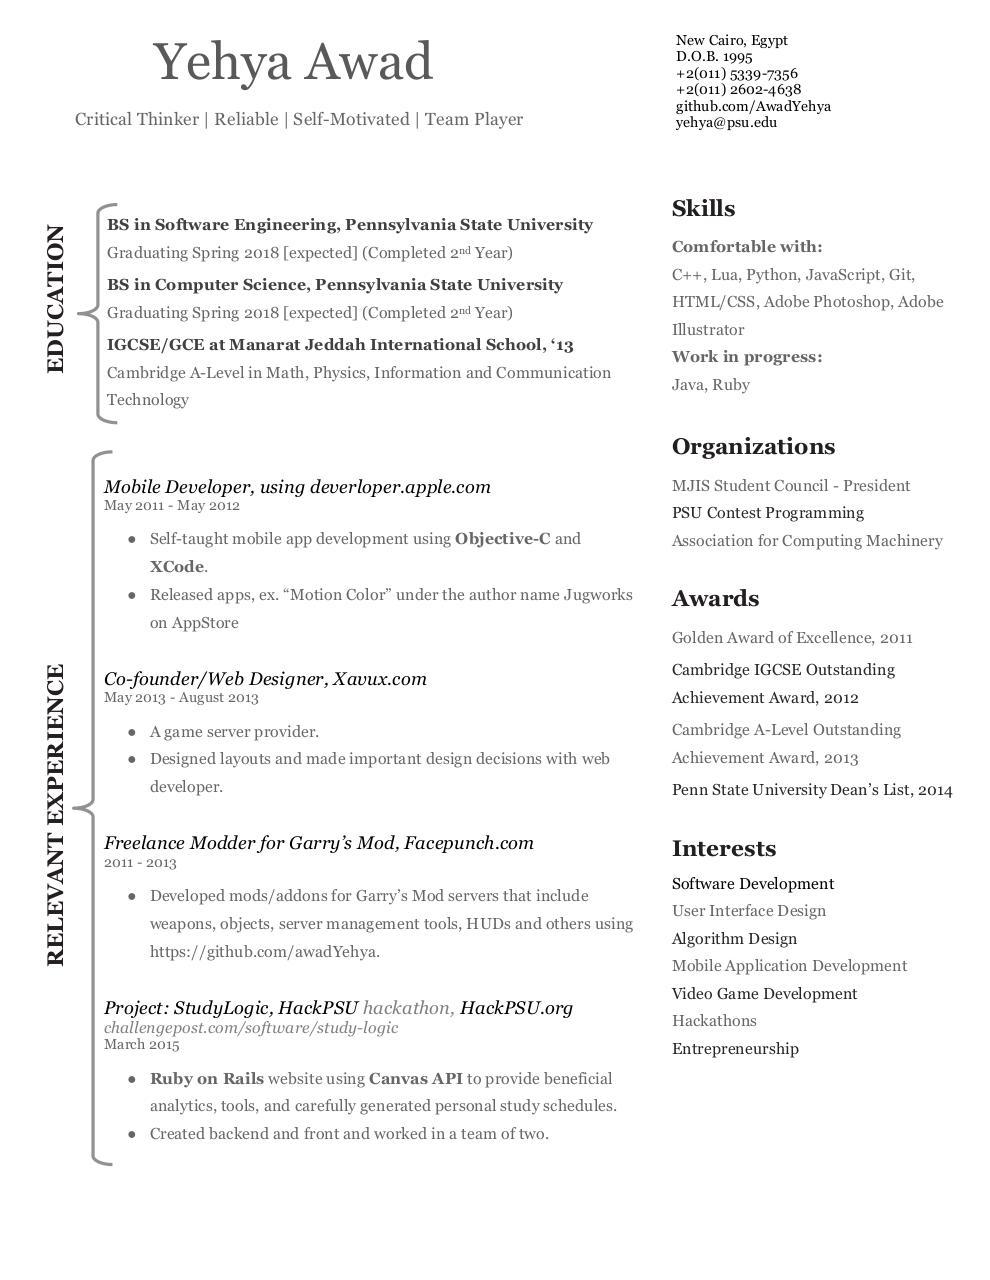 Microsoft Word - Yehya Awad - Resume May 2015.docx (Yehya Awad ...